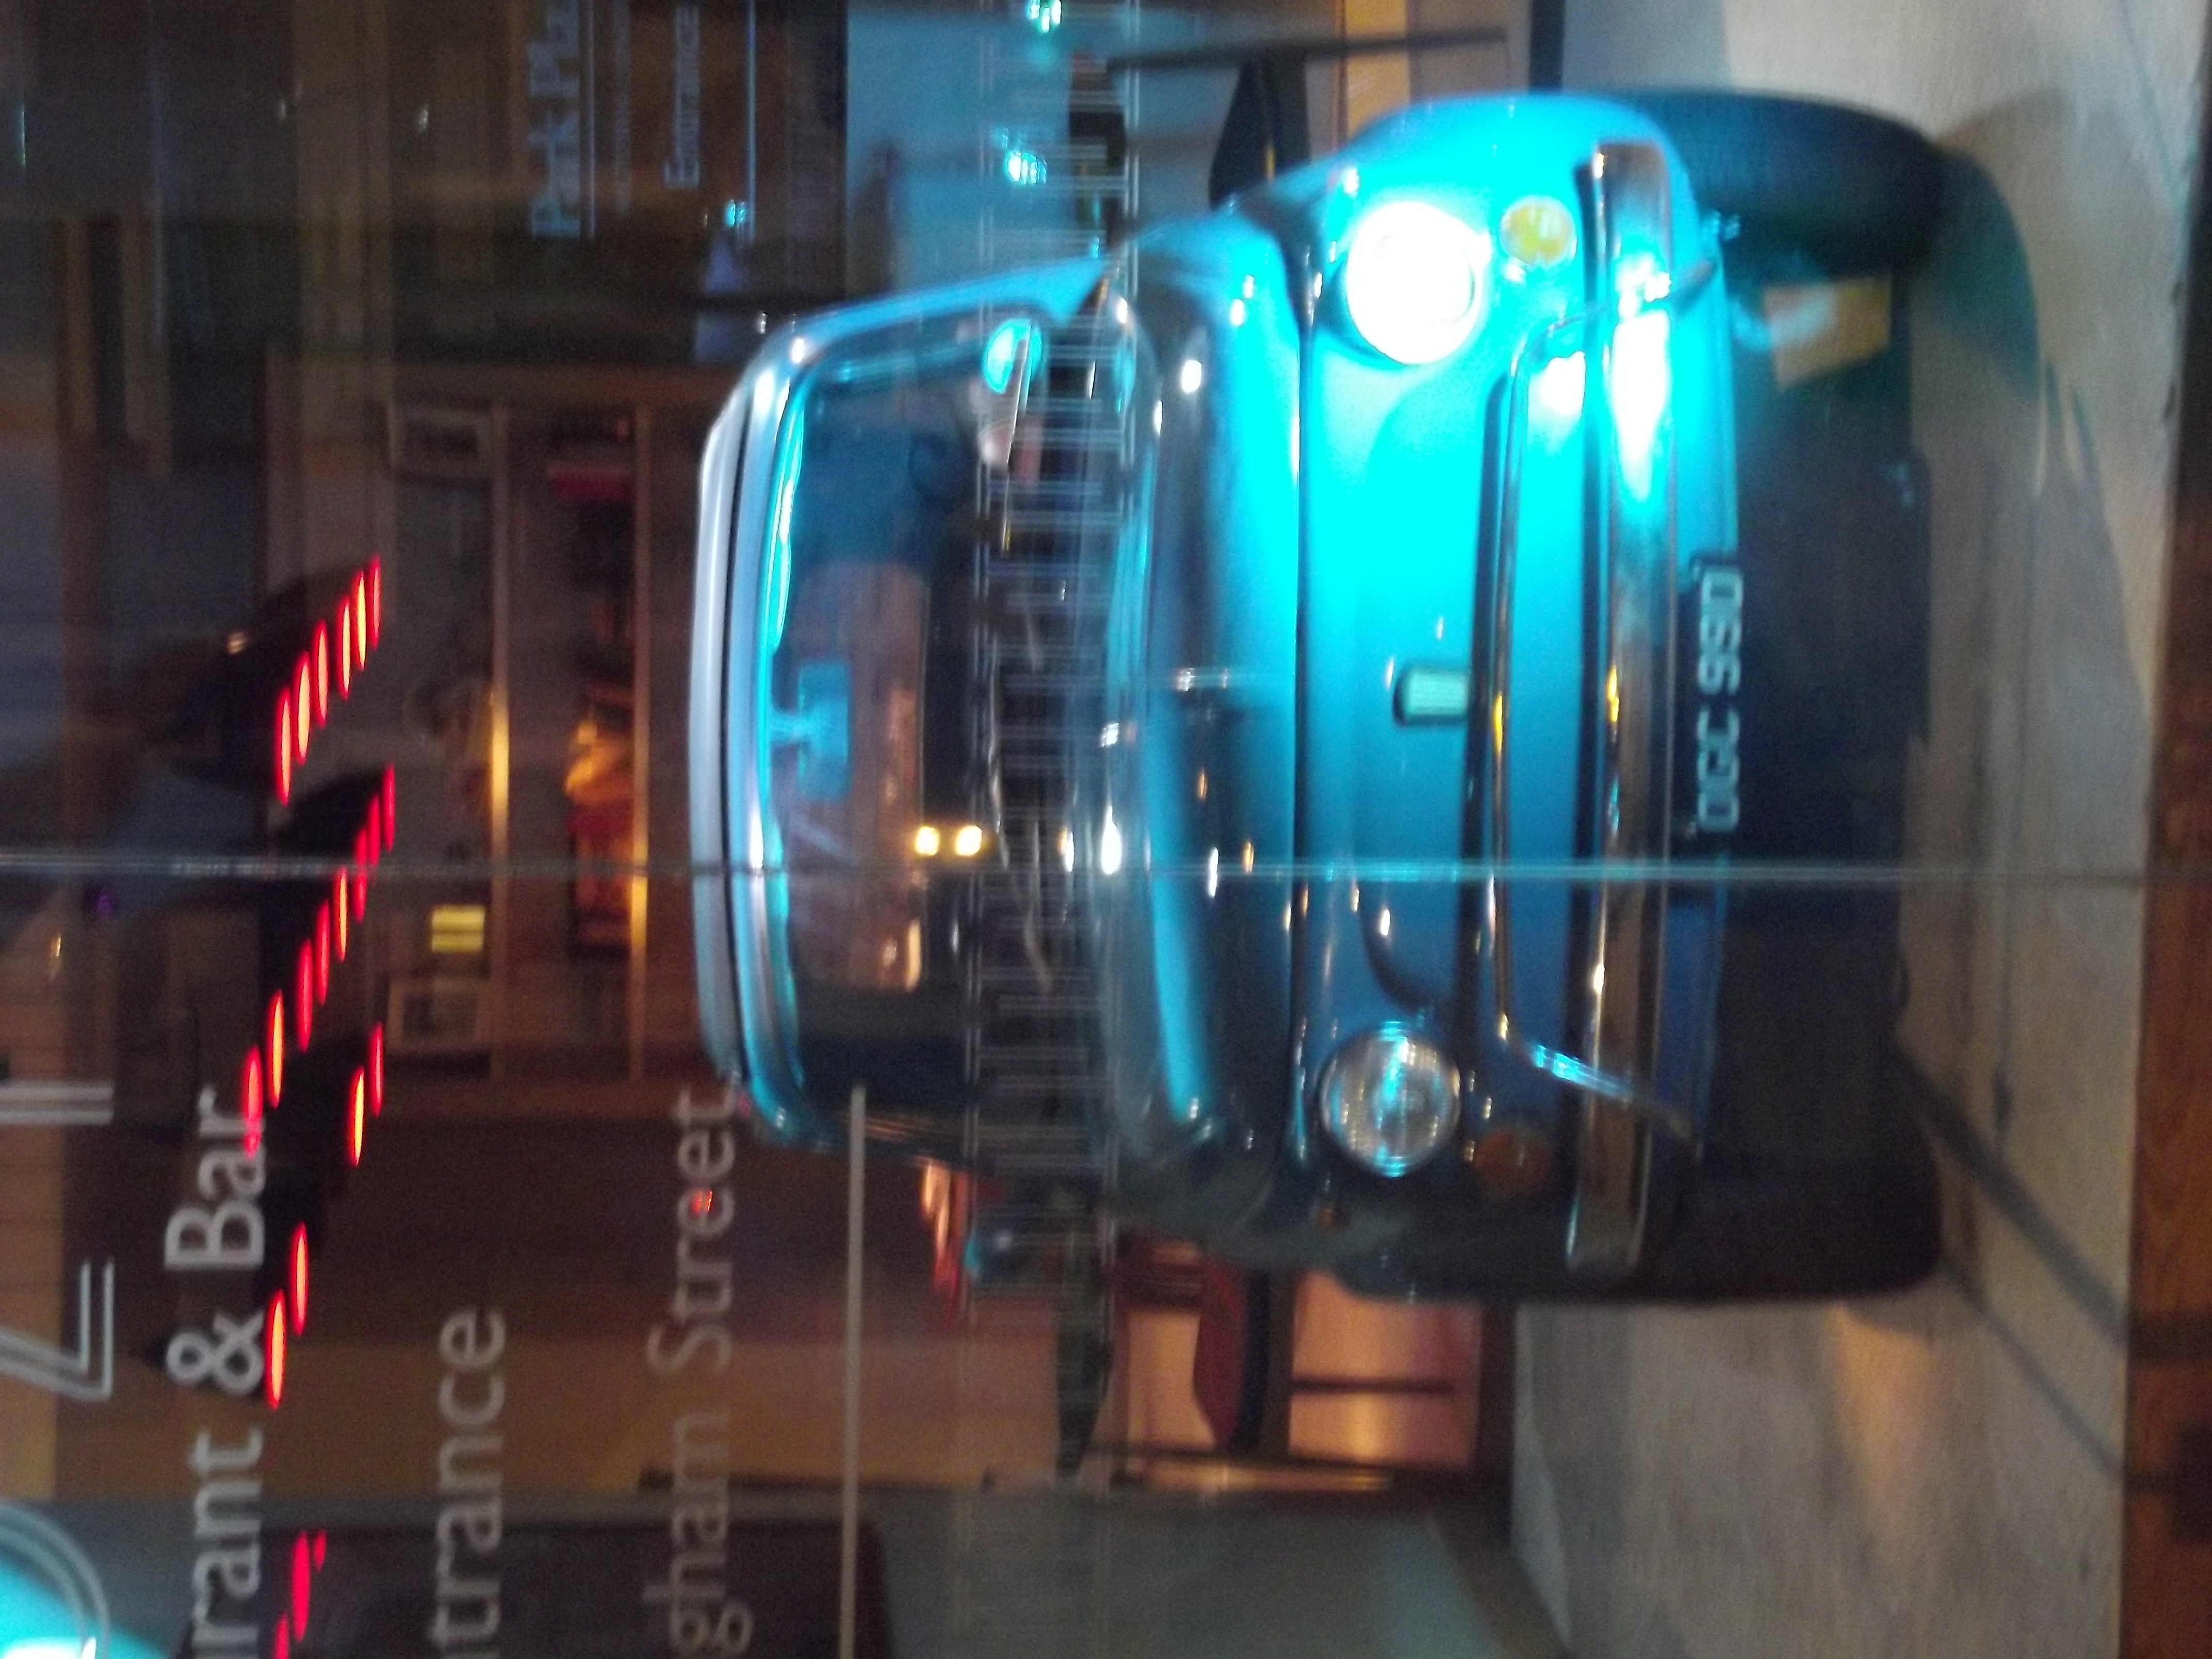 Restaurant Vauxhall Bridge Road